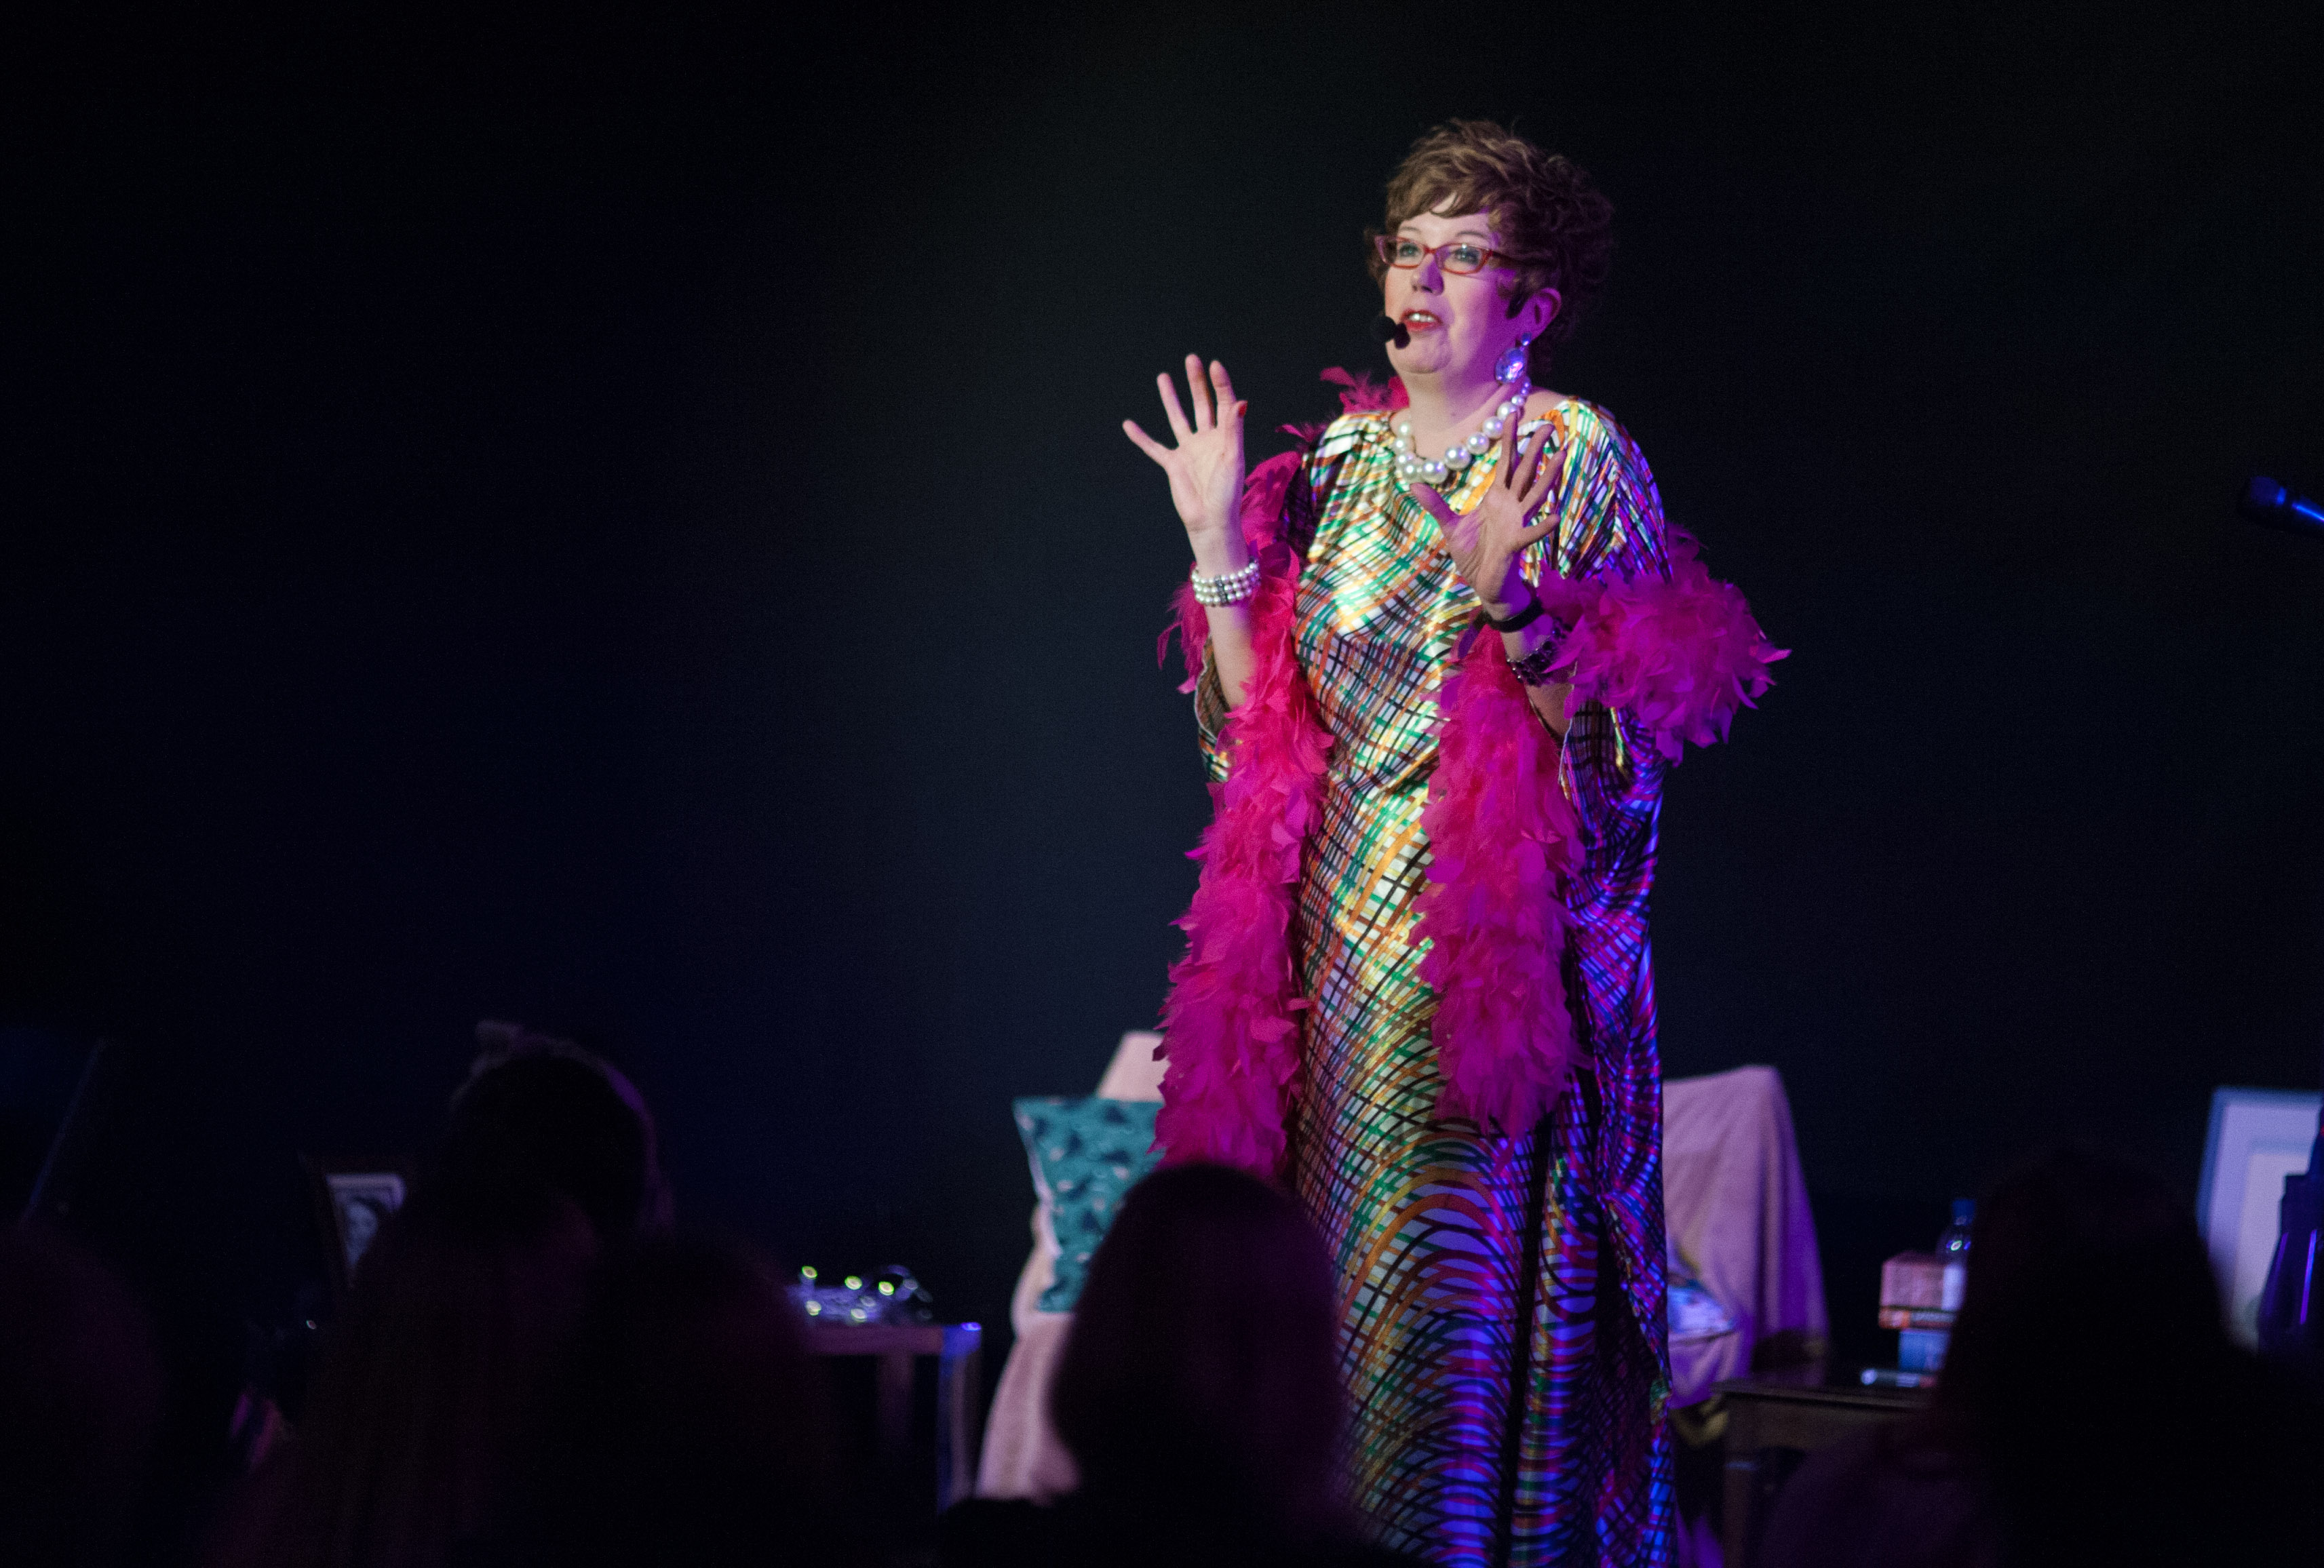 Suburbaret 1: Lorraine Bowen